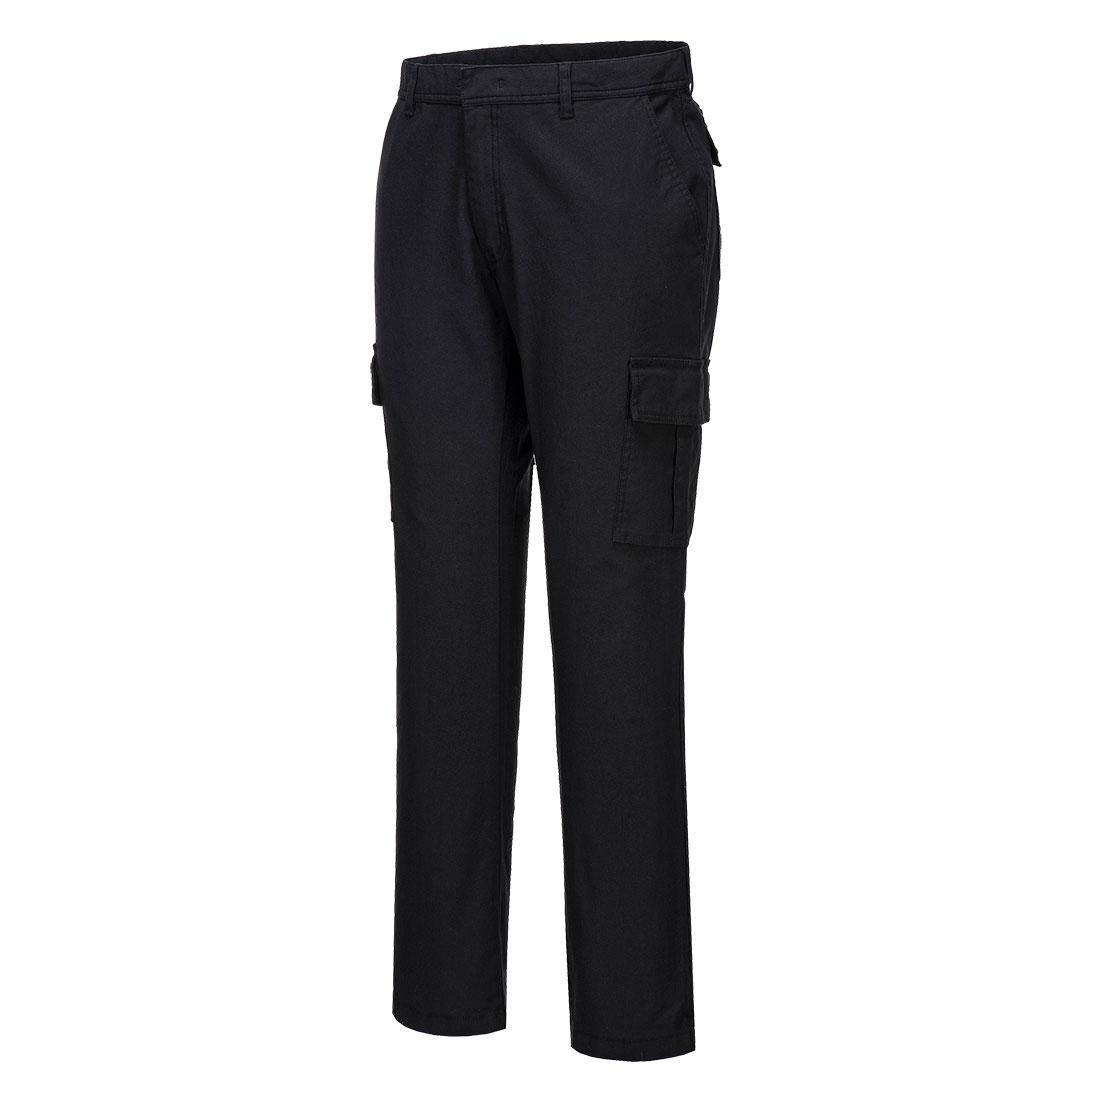 Portwest Stretch Slim Combat Trouser - Black